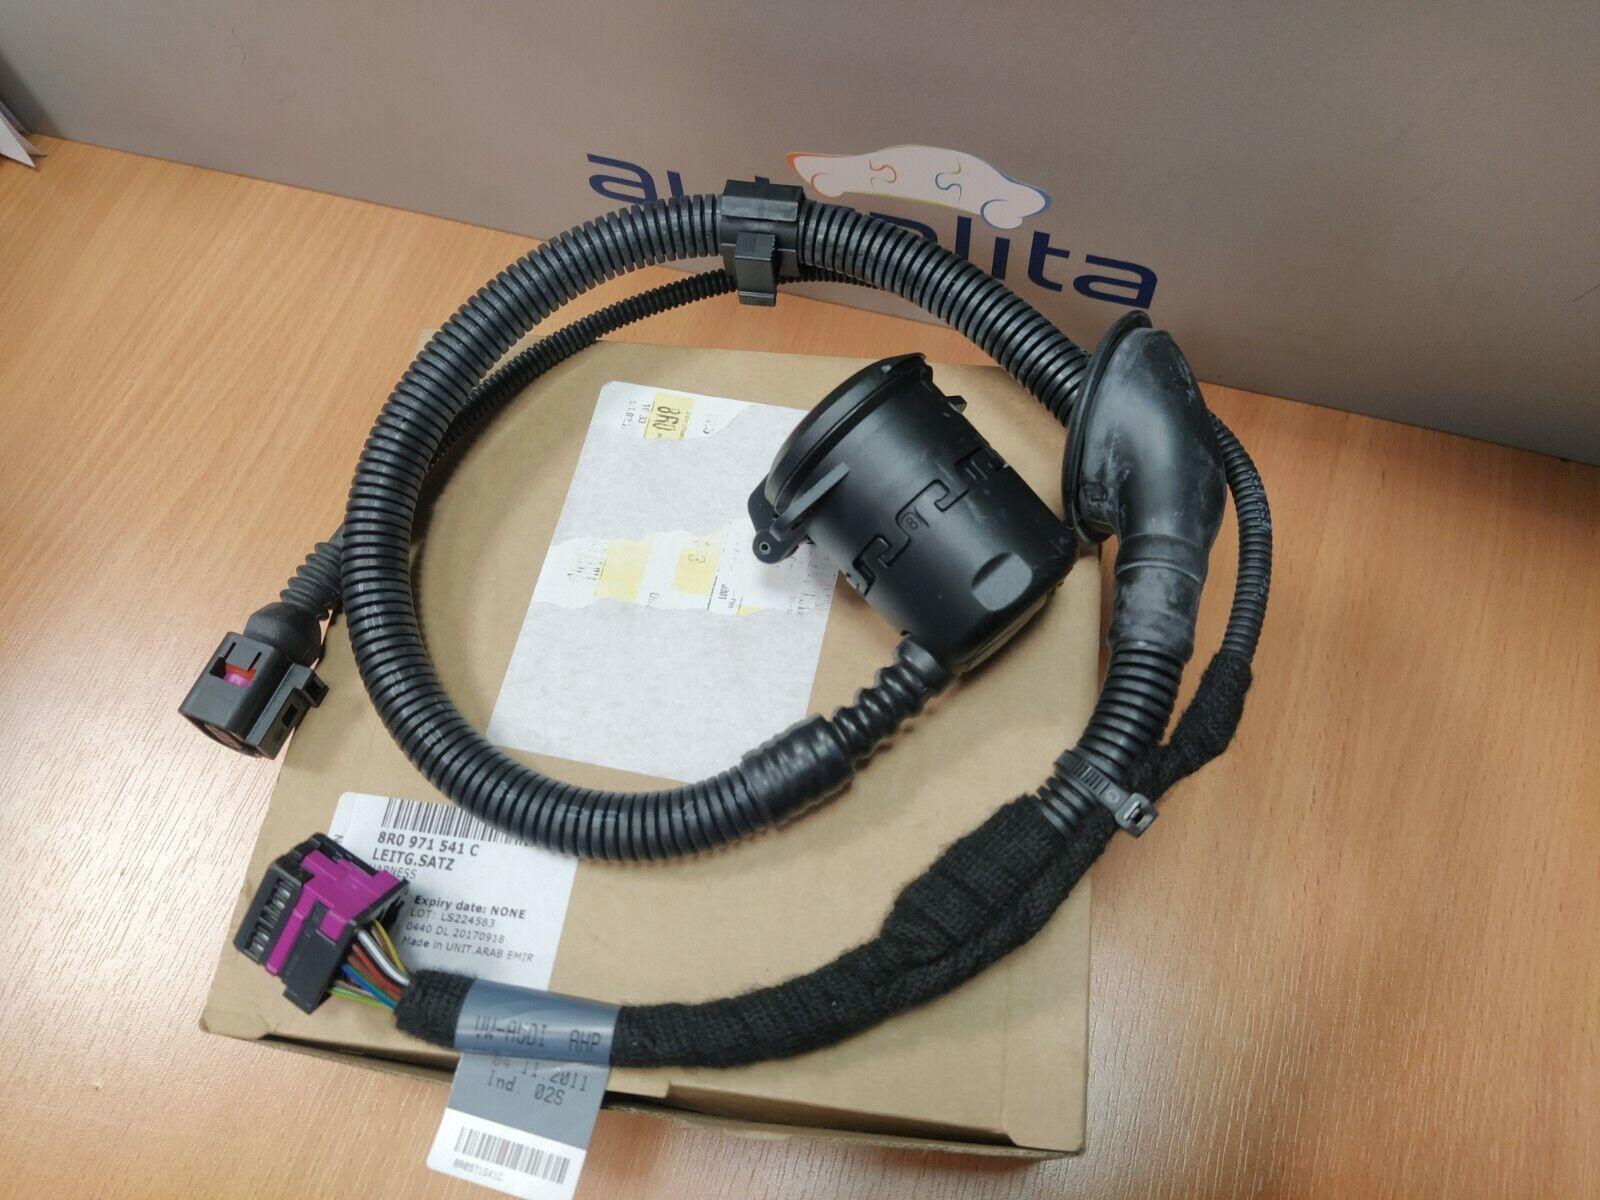 audi q5 hitch wiring audi 8r0800495d for sale online ebay  audi 8r0800495d for sale online ebay